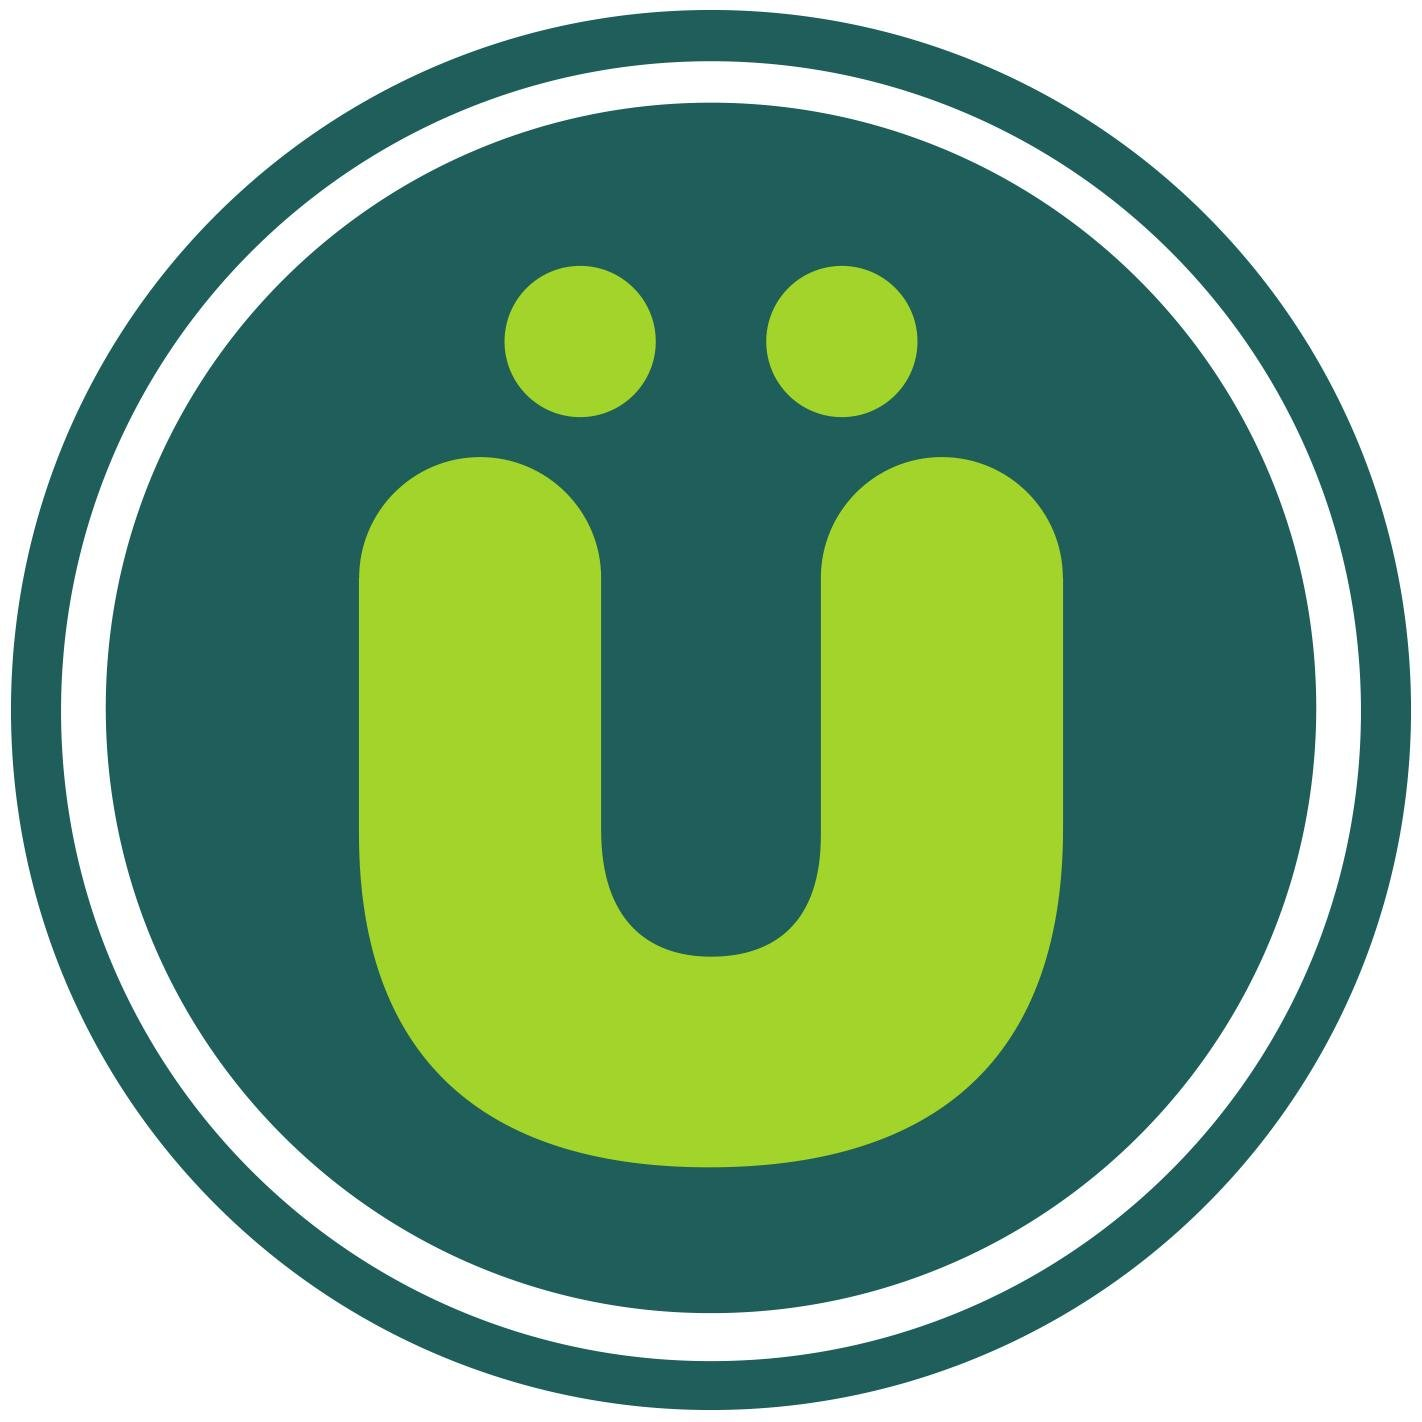 uberfacts net worth